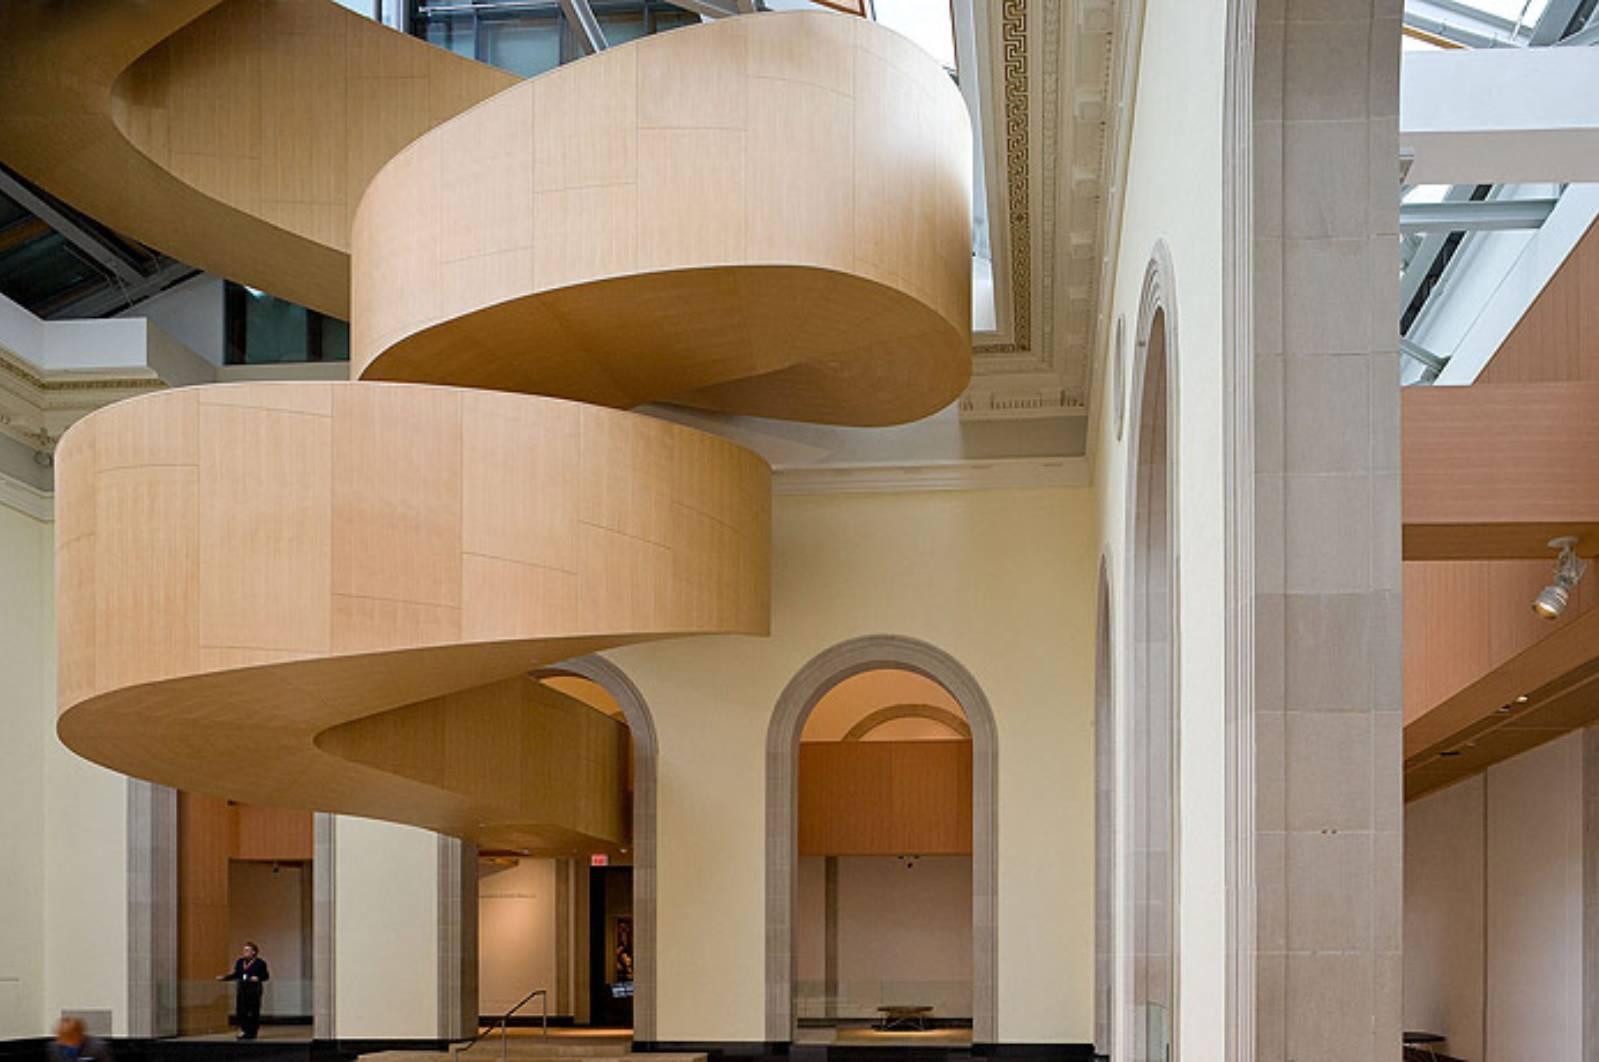 Galería De Arte De Ontario Boletos: 1000+ Images About Architecture On Pinterest